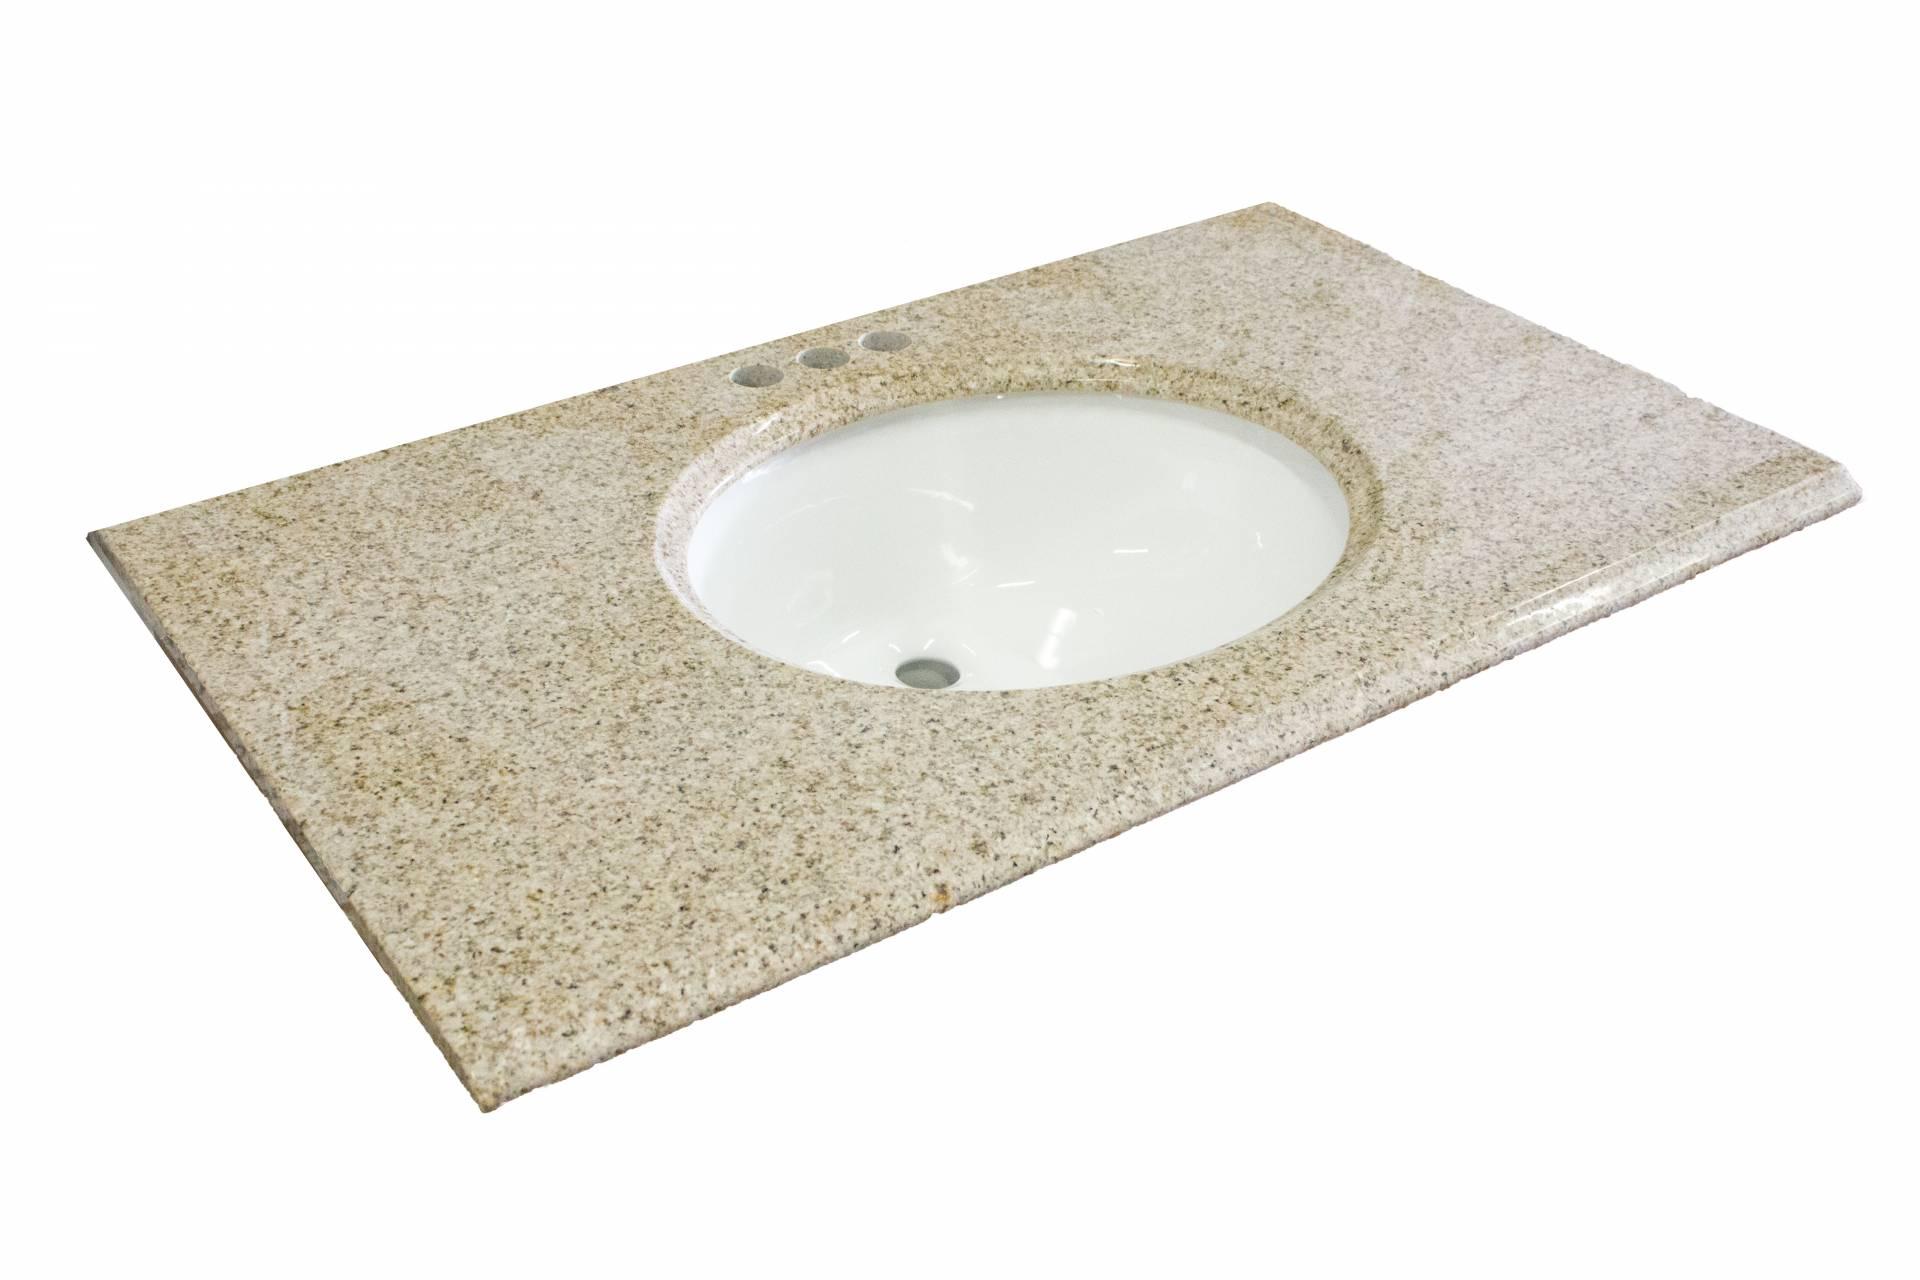 Granite Vanity Top 37 X 19 Sunset Heeby S Surplus Inc